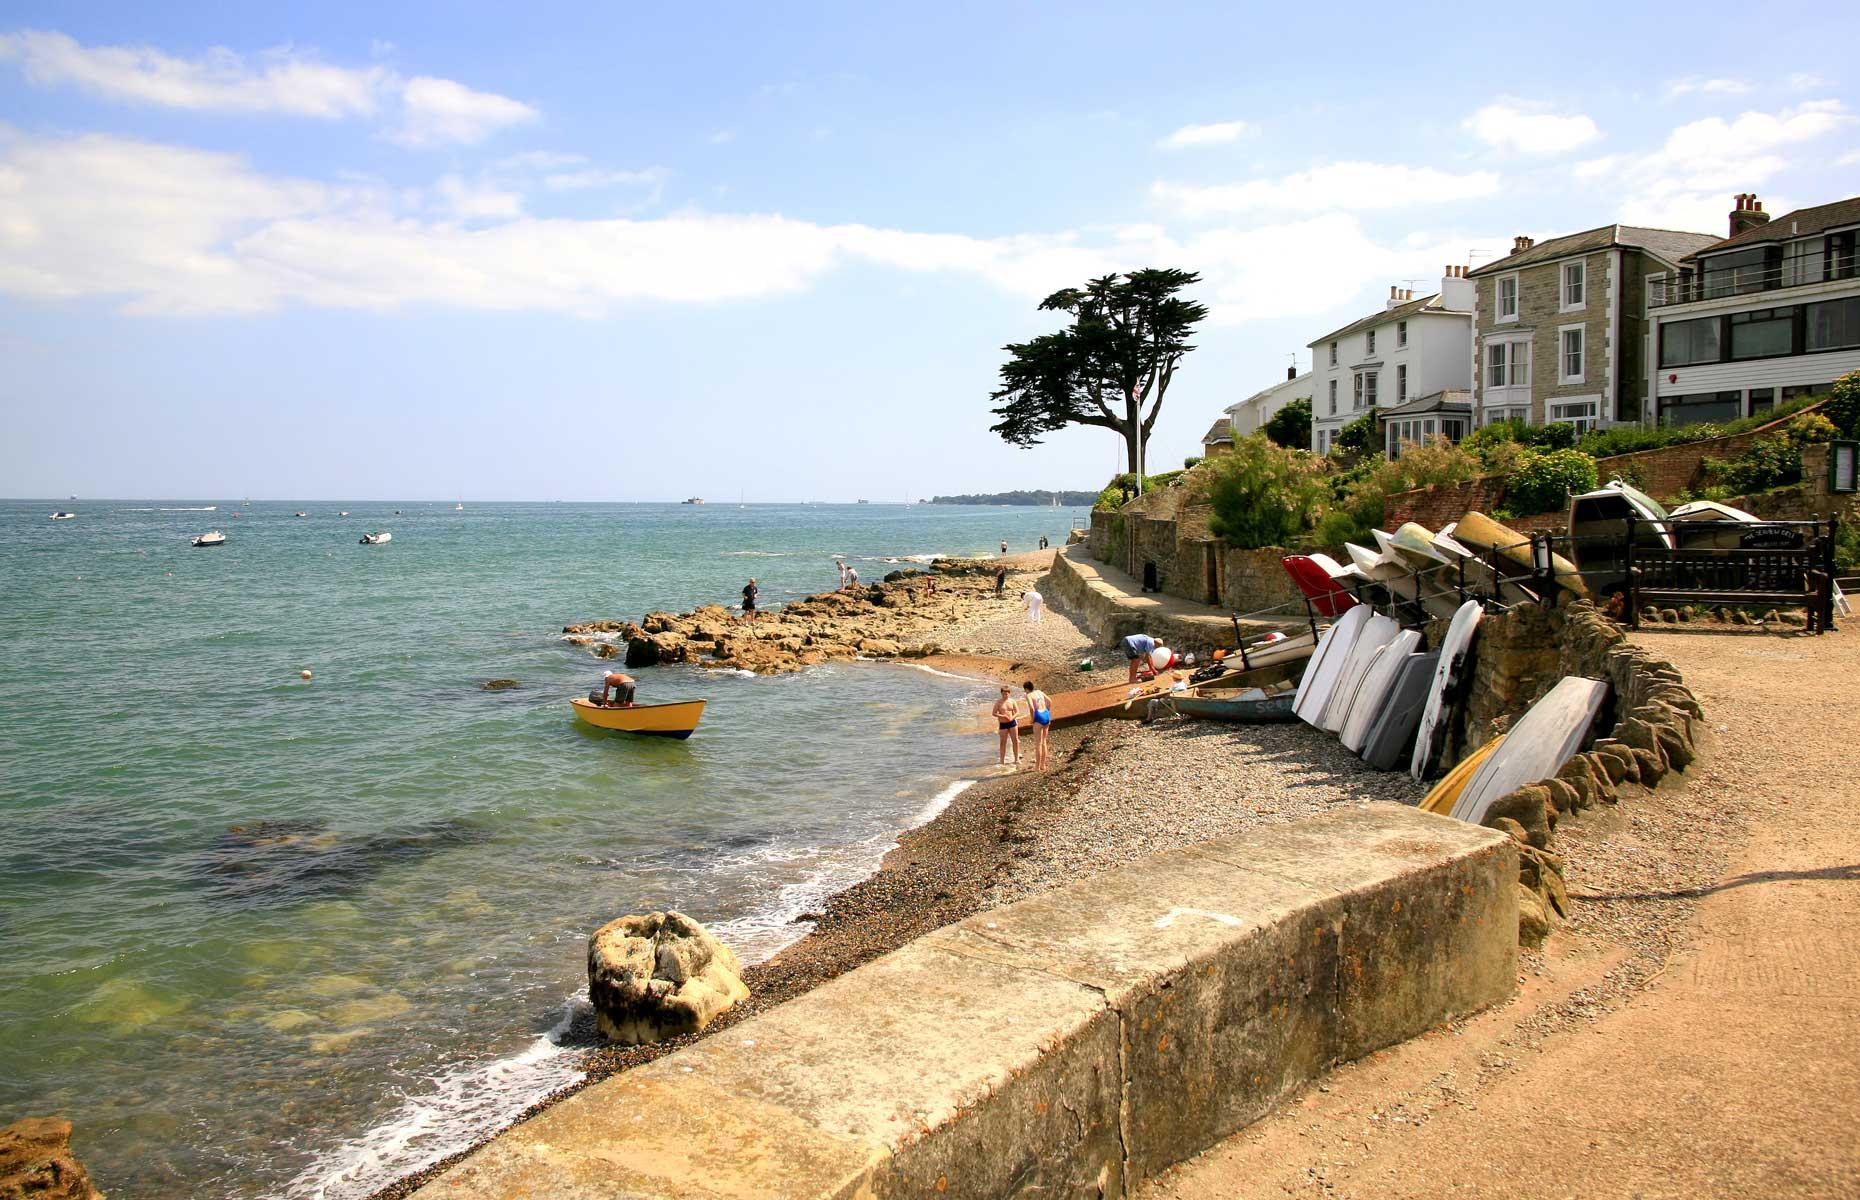 Seaview cove, Isle of Wight